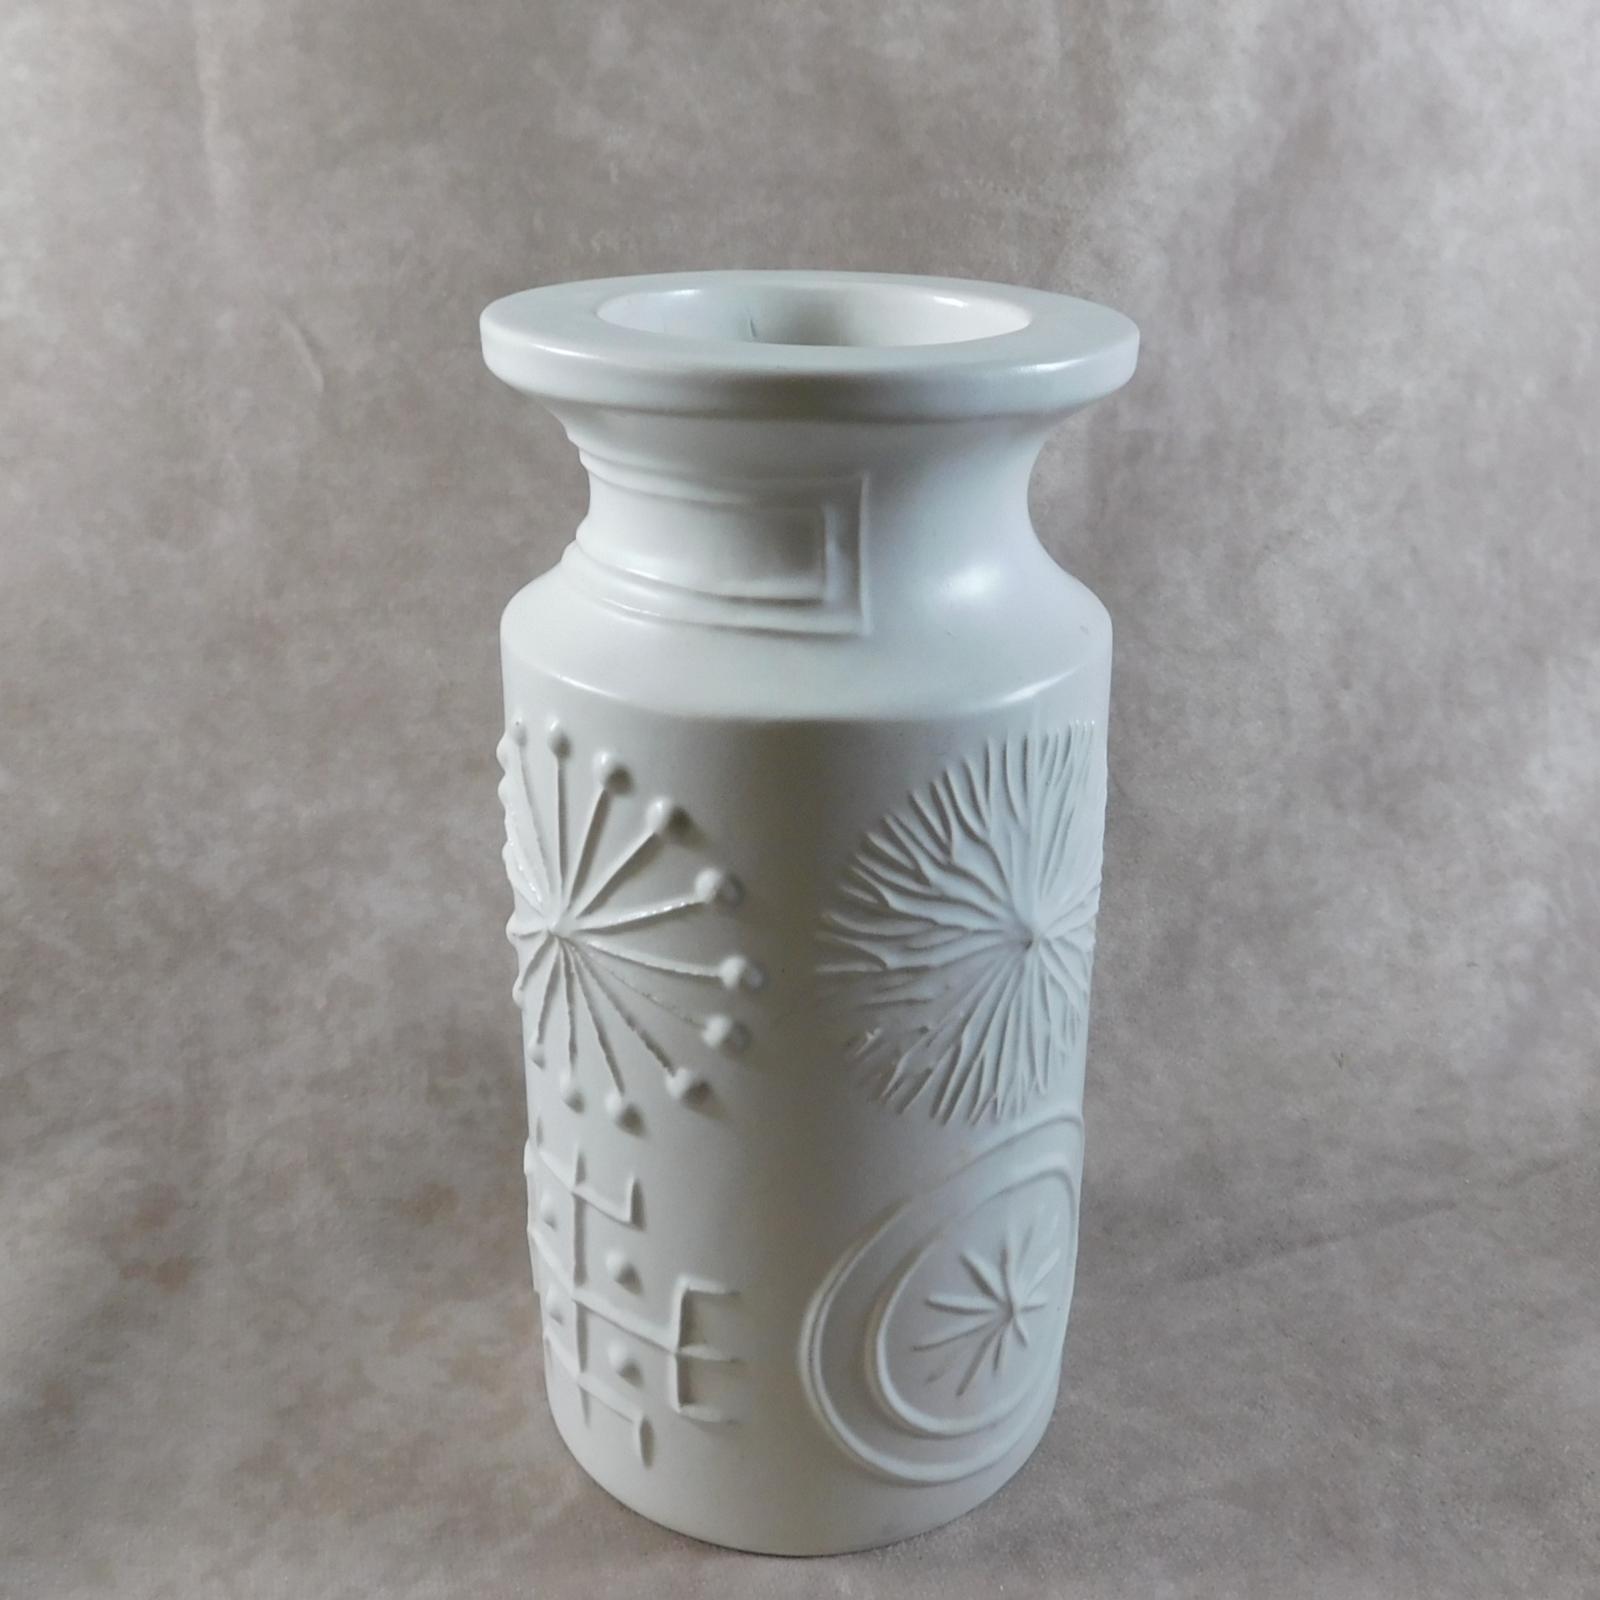 """Totem"" Vase by Susan Williams-Ellis for Portmeirion (1 of 1)"